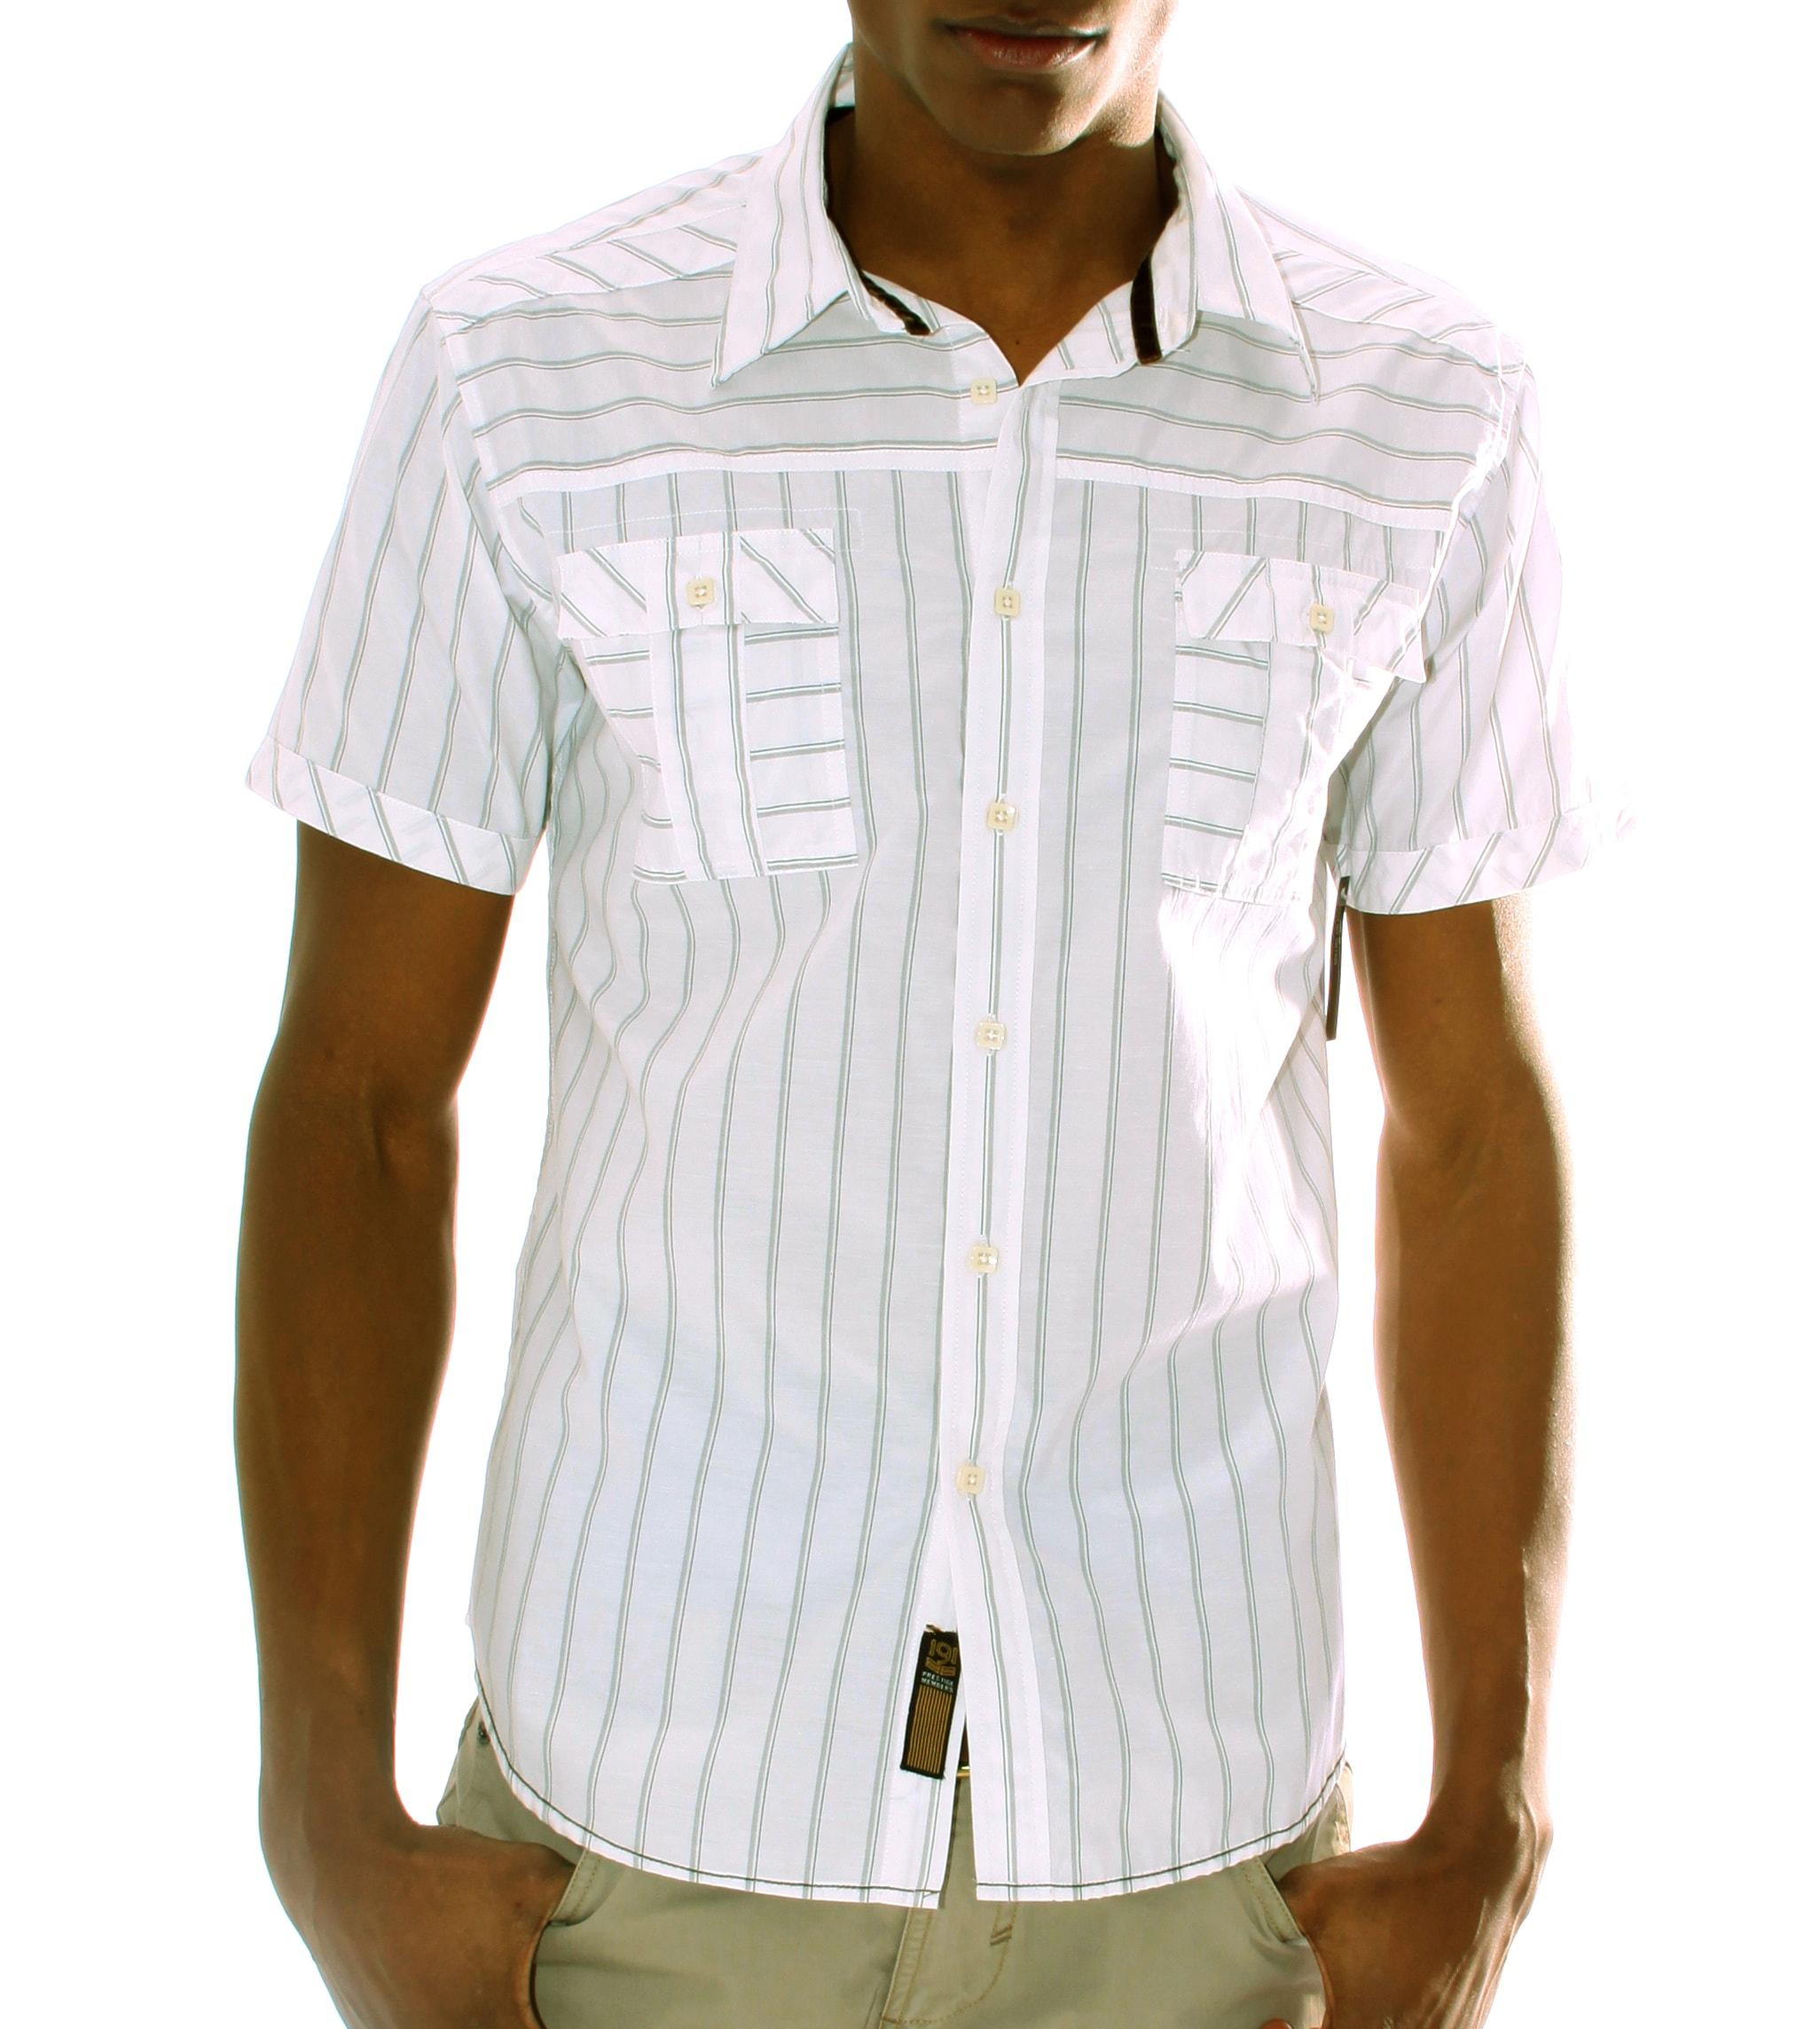 191 Unlimted Men's White Striped Shirt